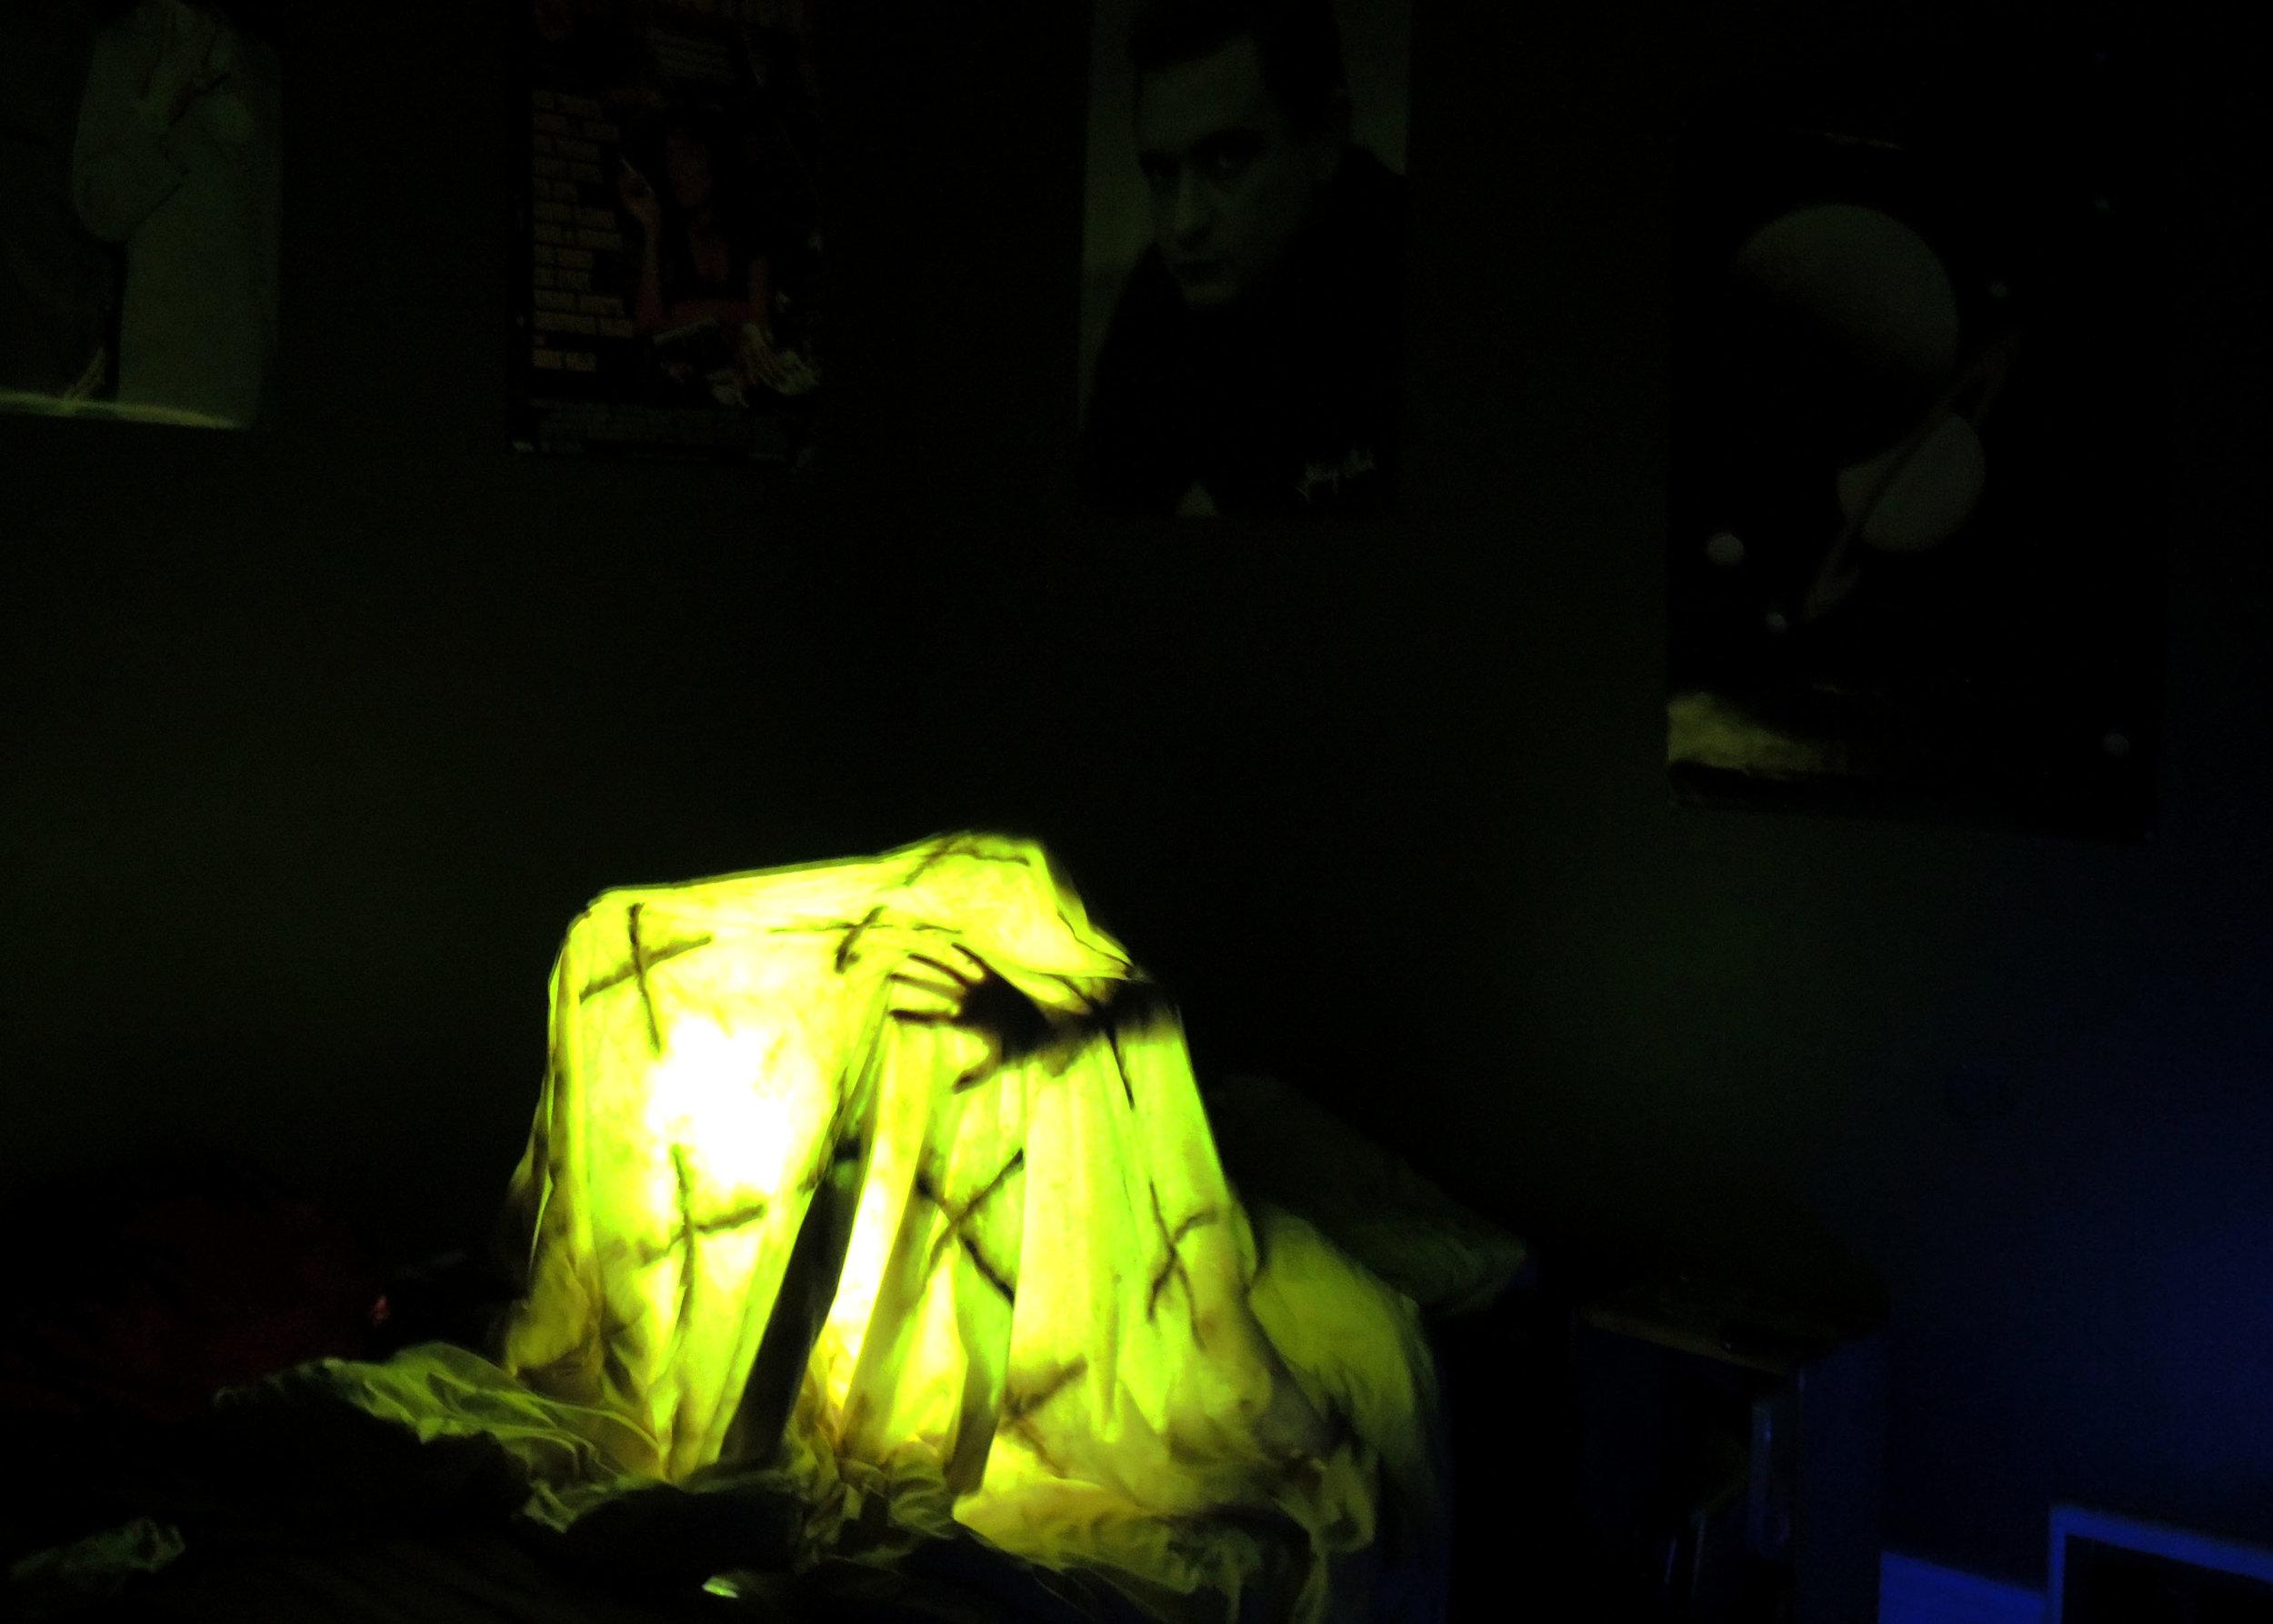 Copy of glow.jpg